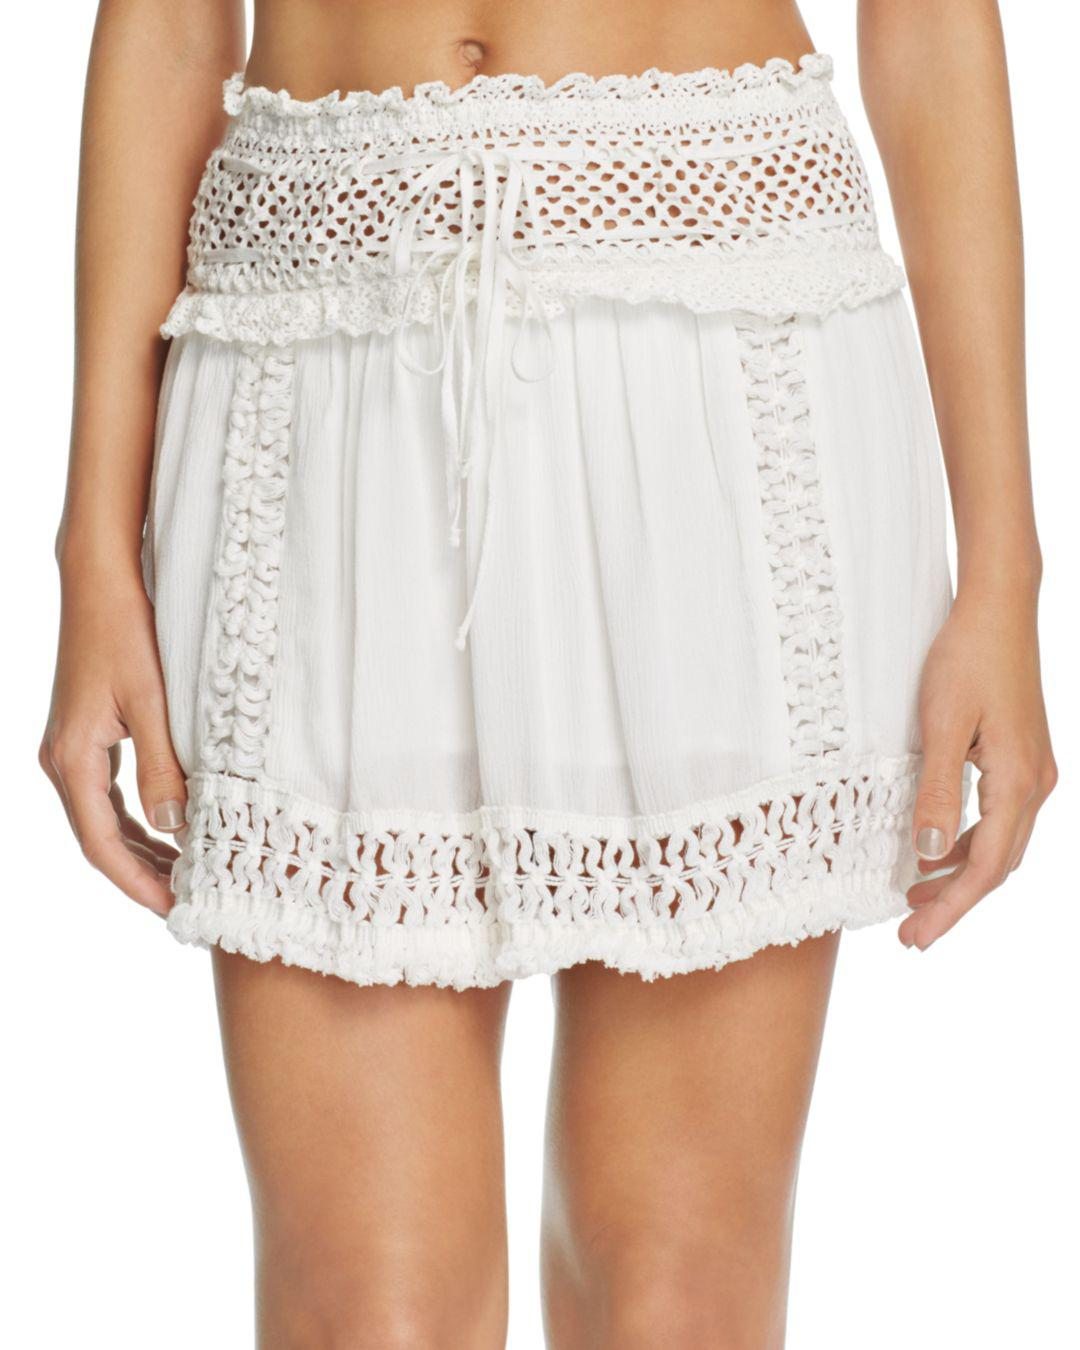 d3a8660a119f5 Lyst - Surf Gypsy Crochet Fringe Mini Skirt Swim Cover-up in White